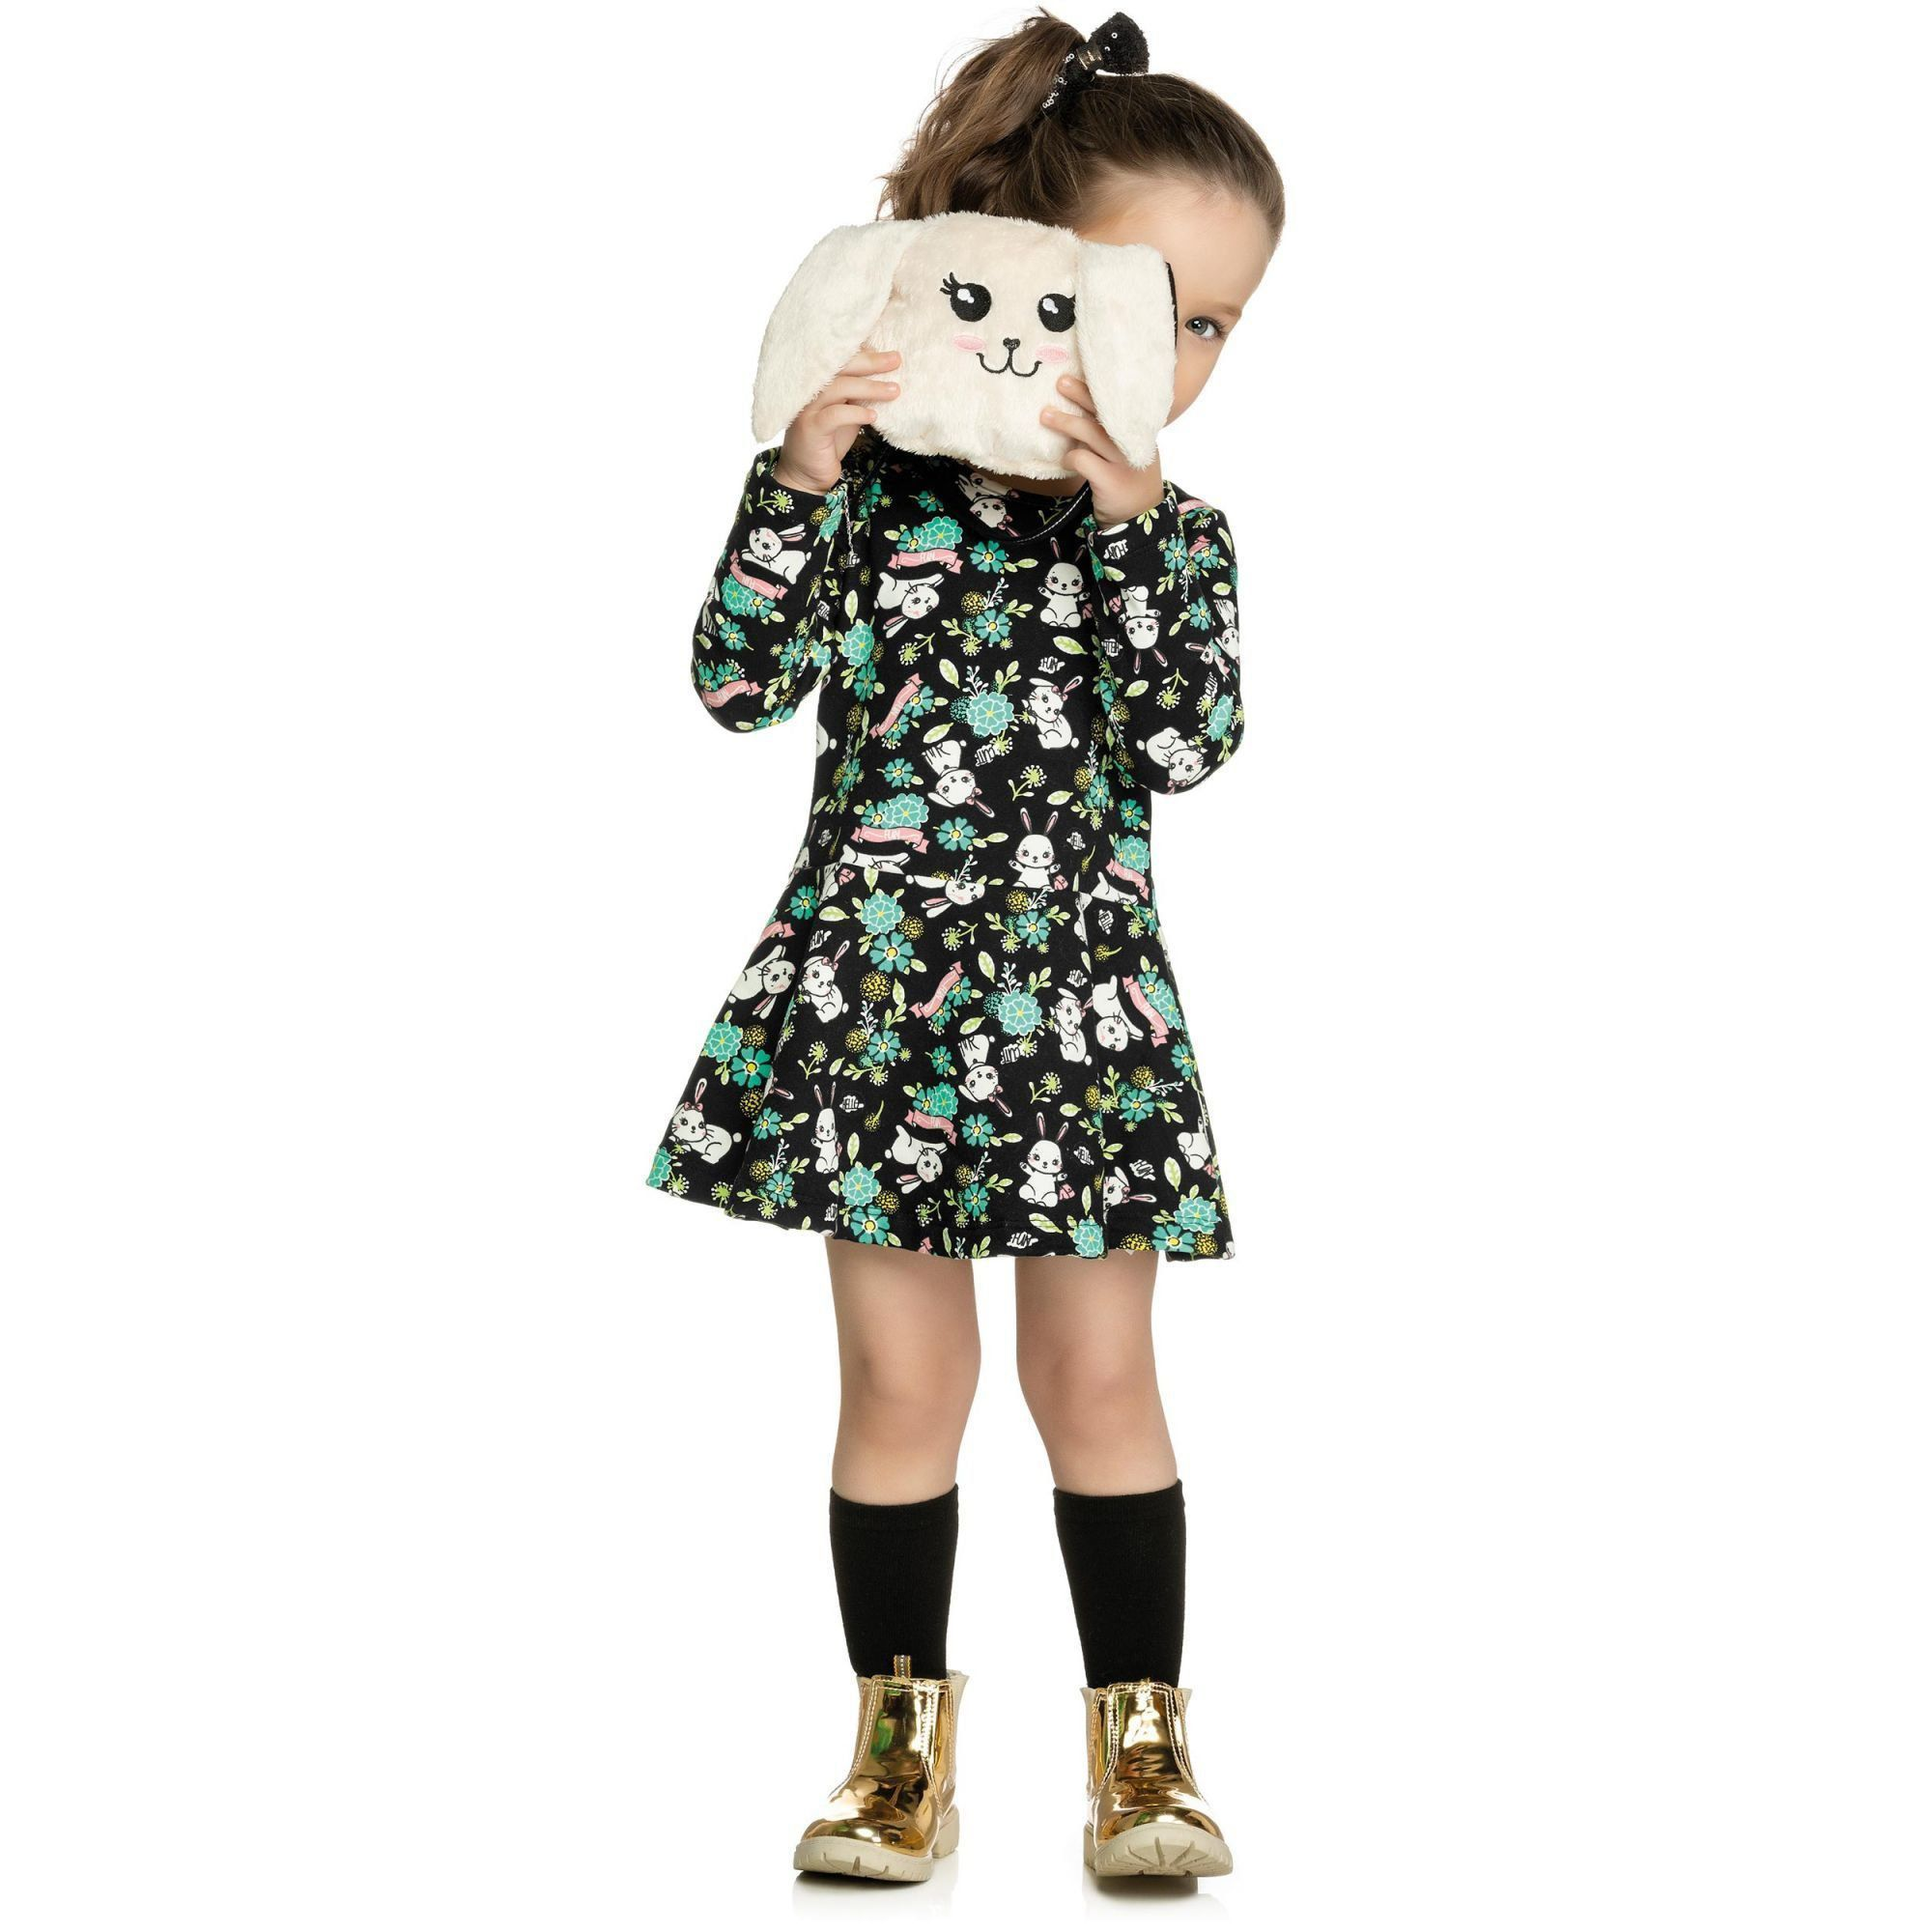 Vestido Infantil Inverno Preto Coelhinho Elian